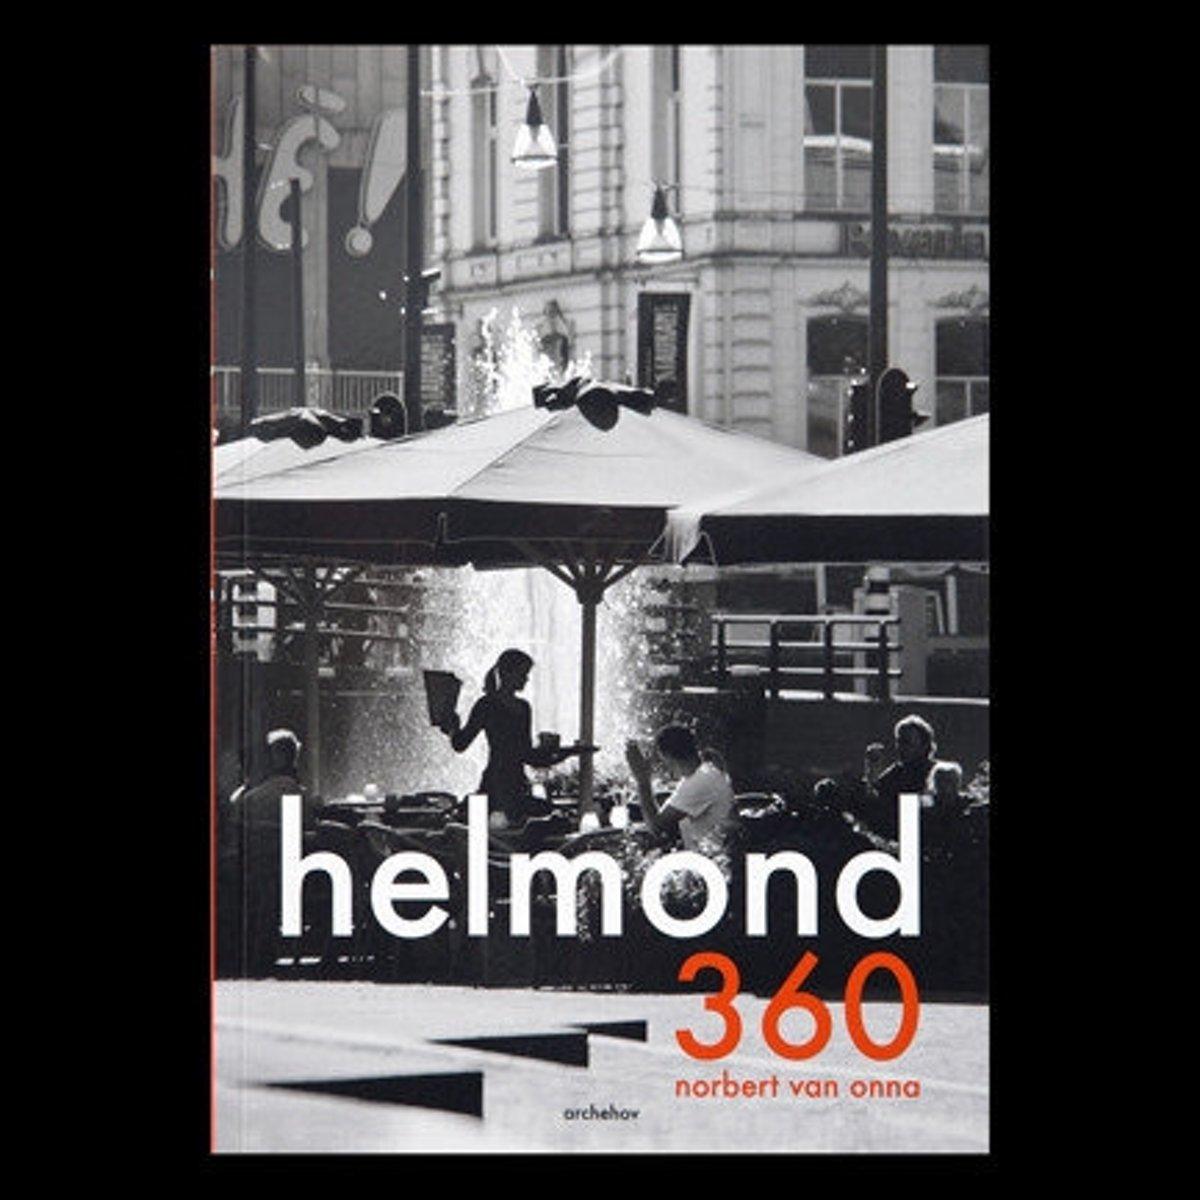 helmond-360